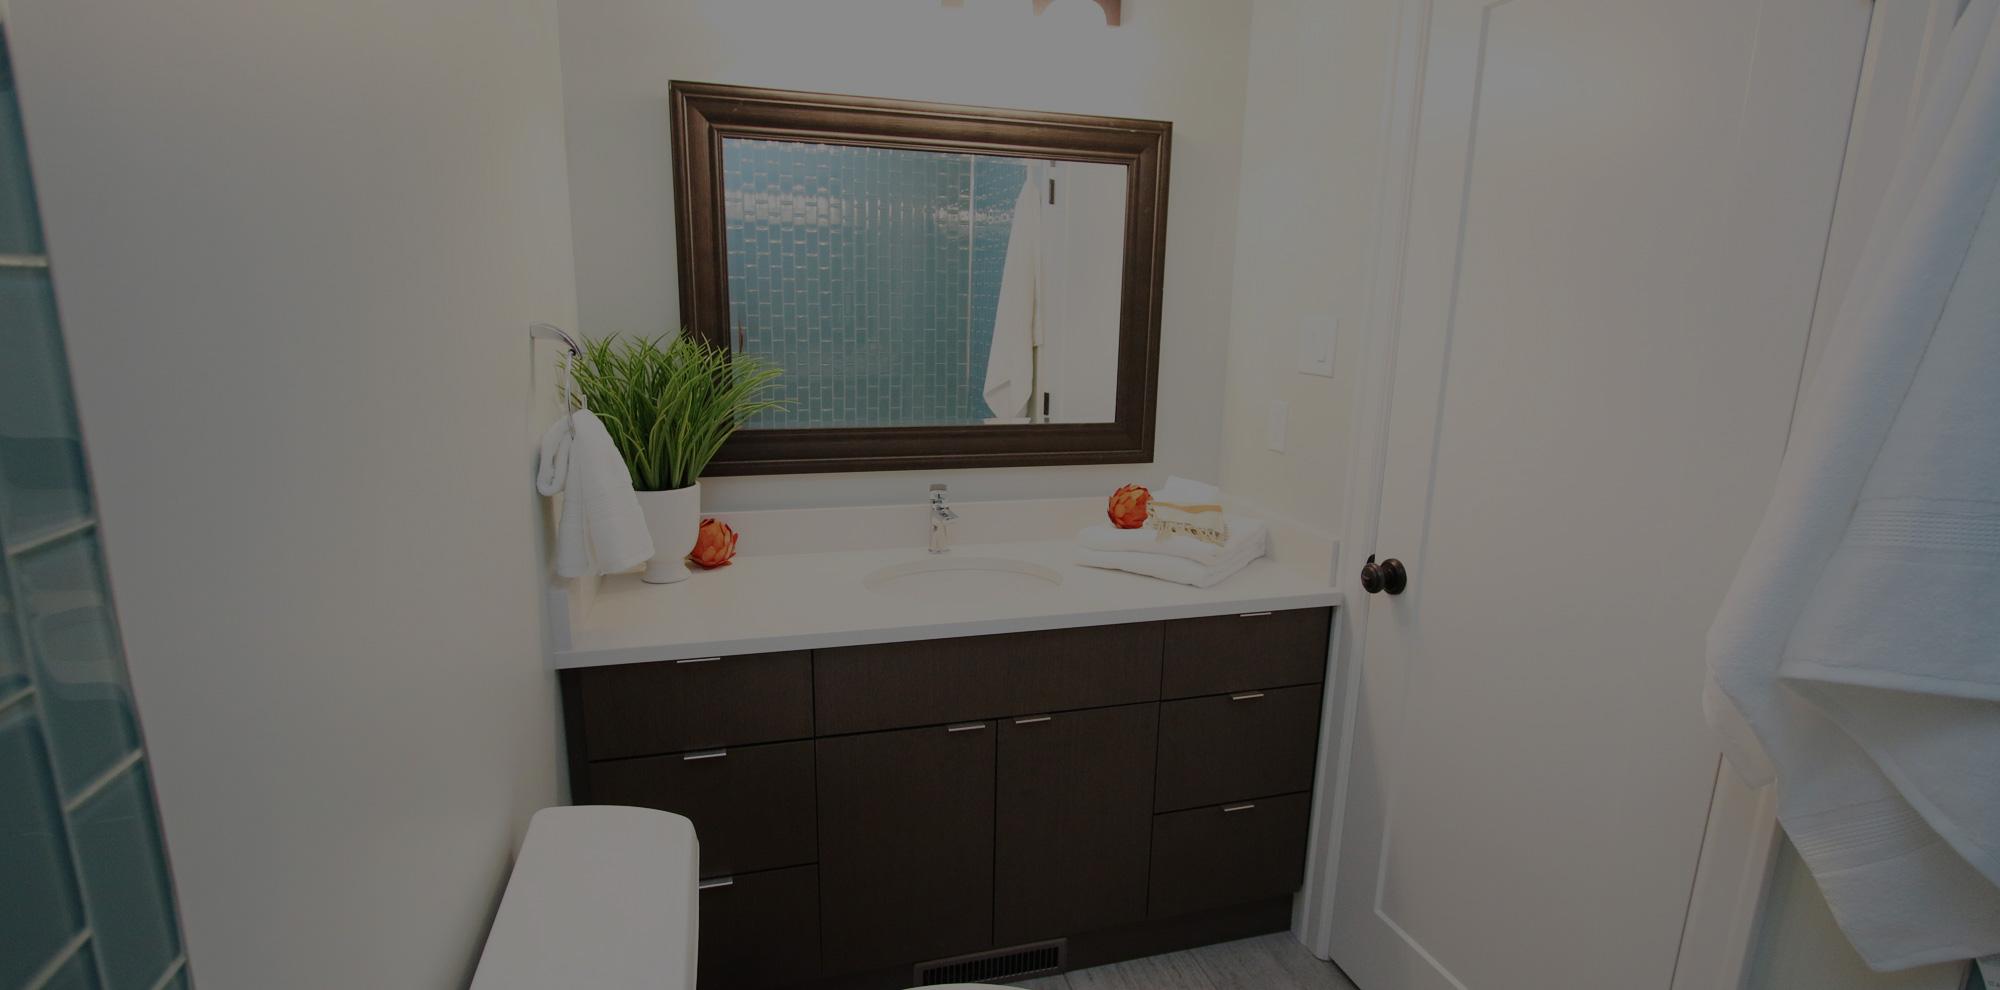 bathroomdark